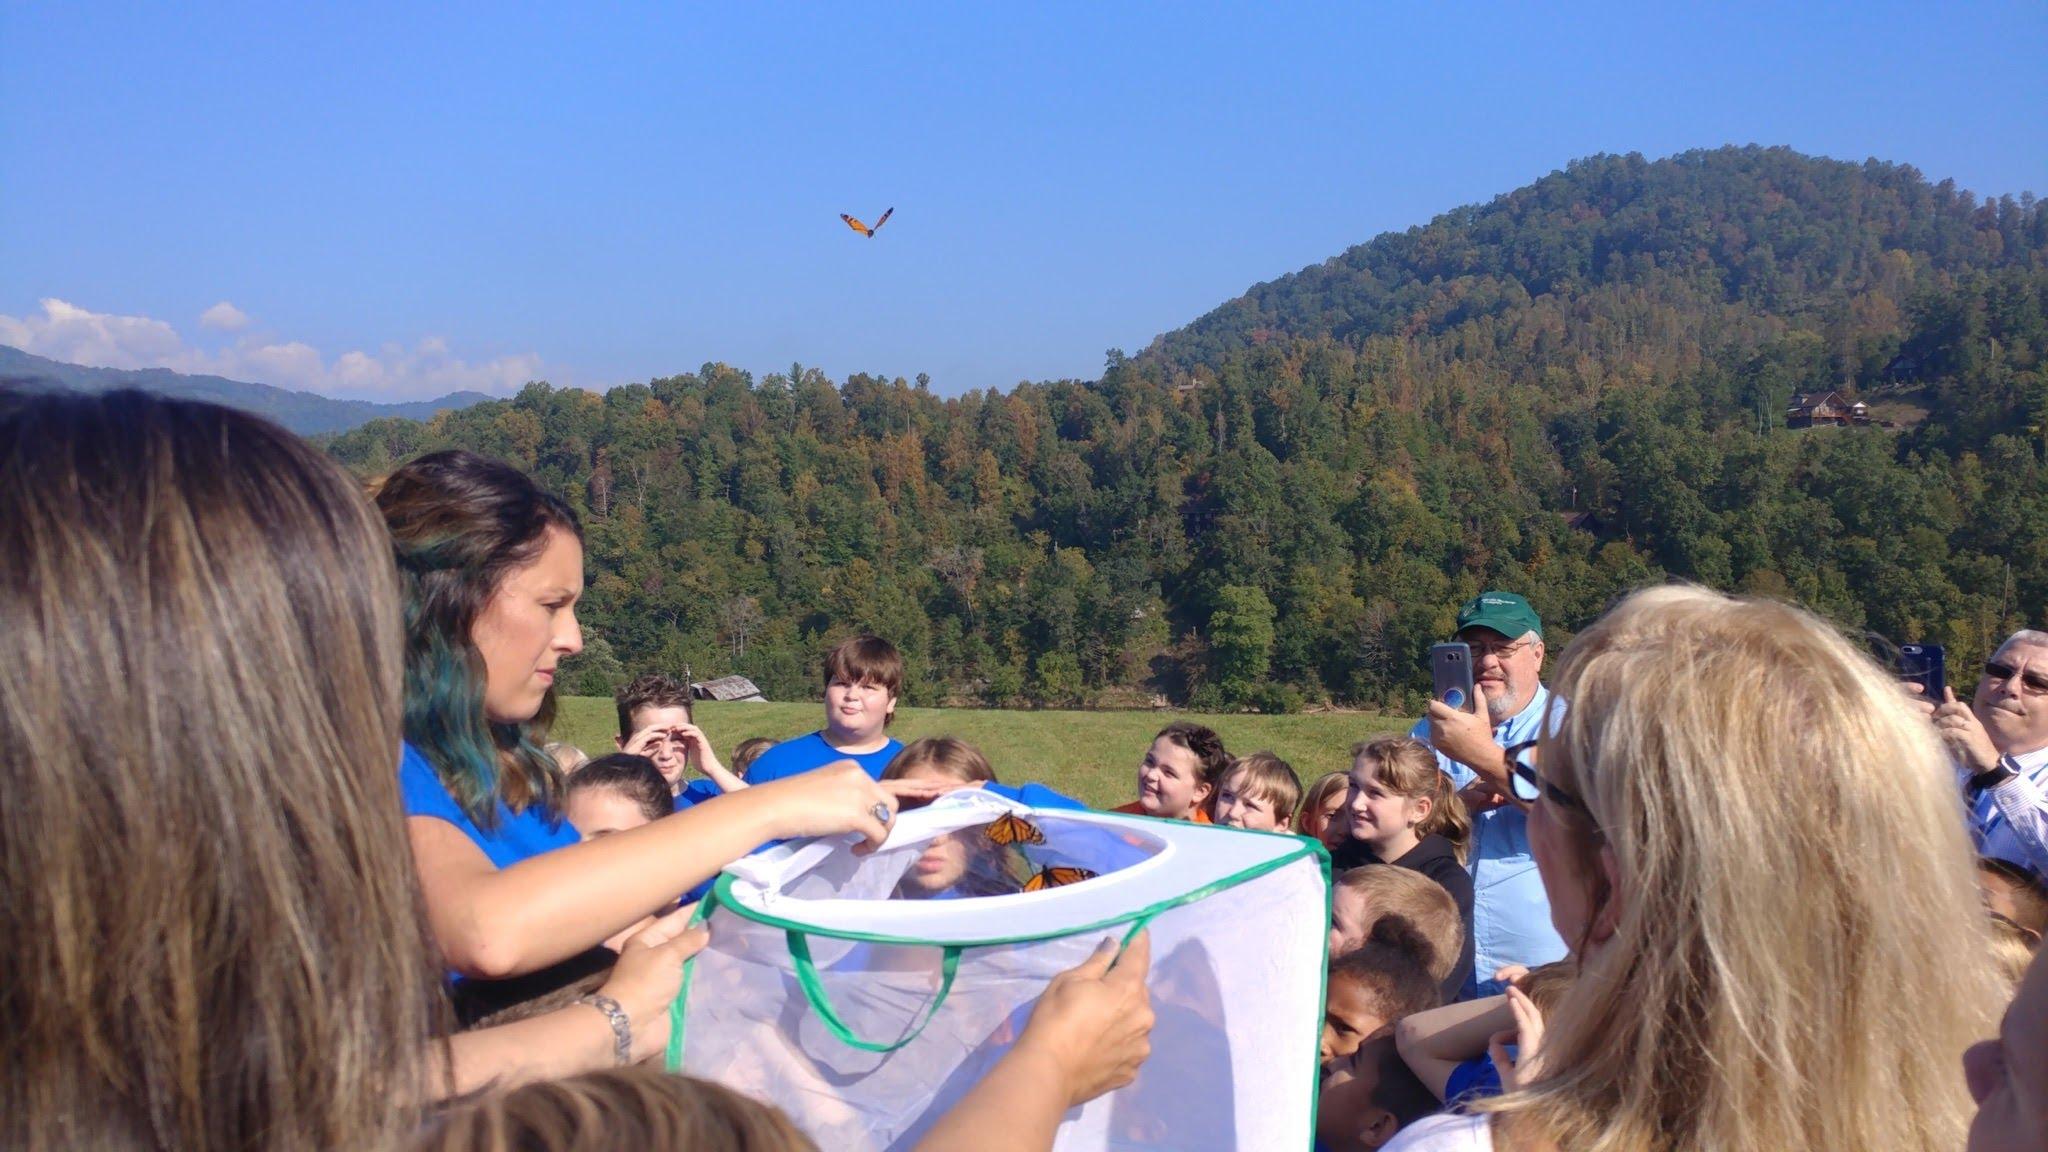 Releasing of our butterflies!